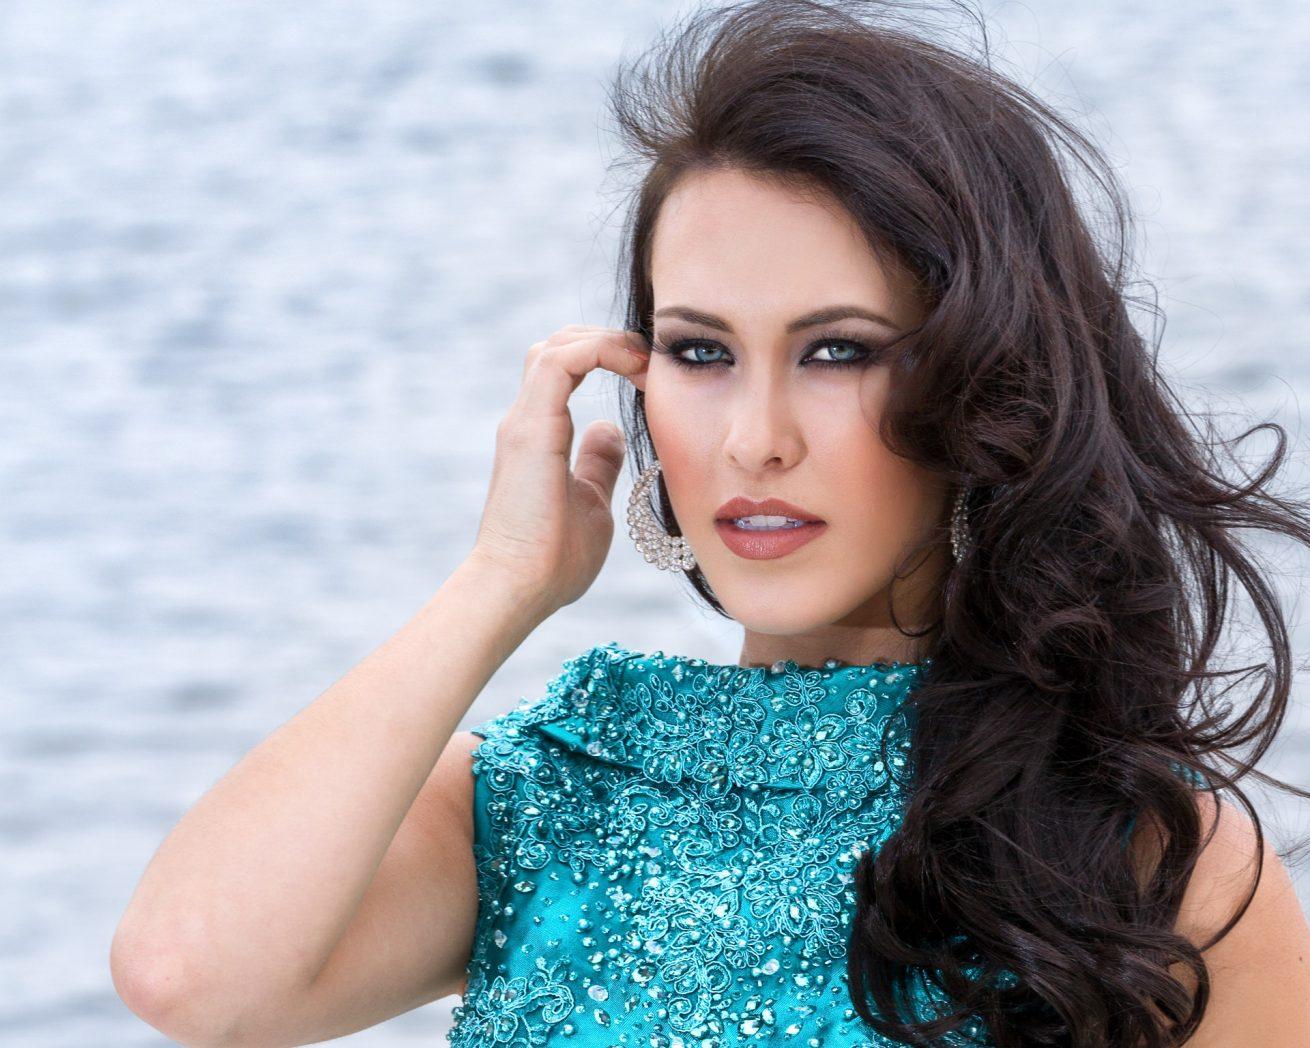 Miss United States 2014 / Miss World Americas 2014 – Elizabeth Safrit